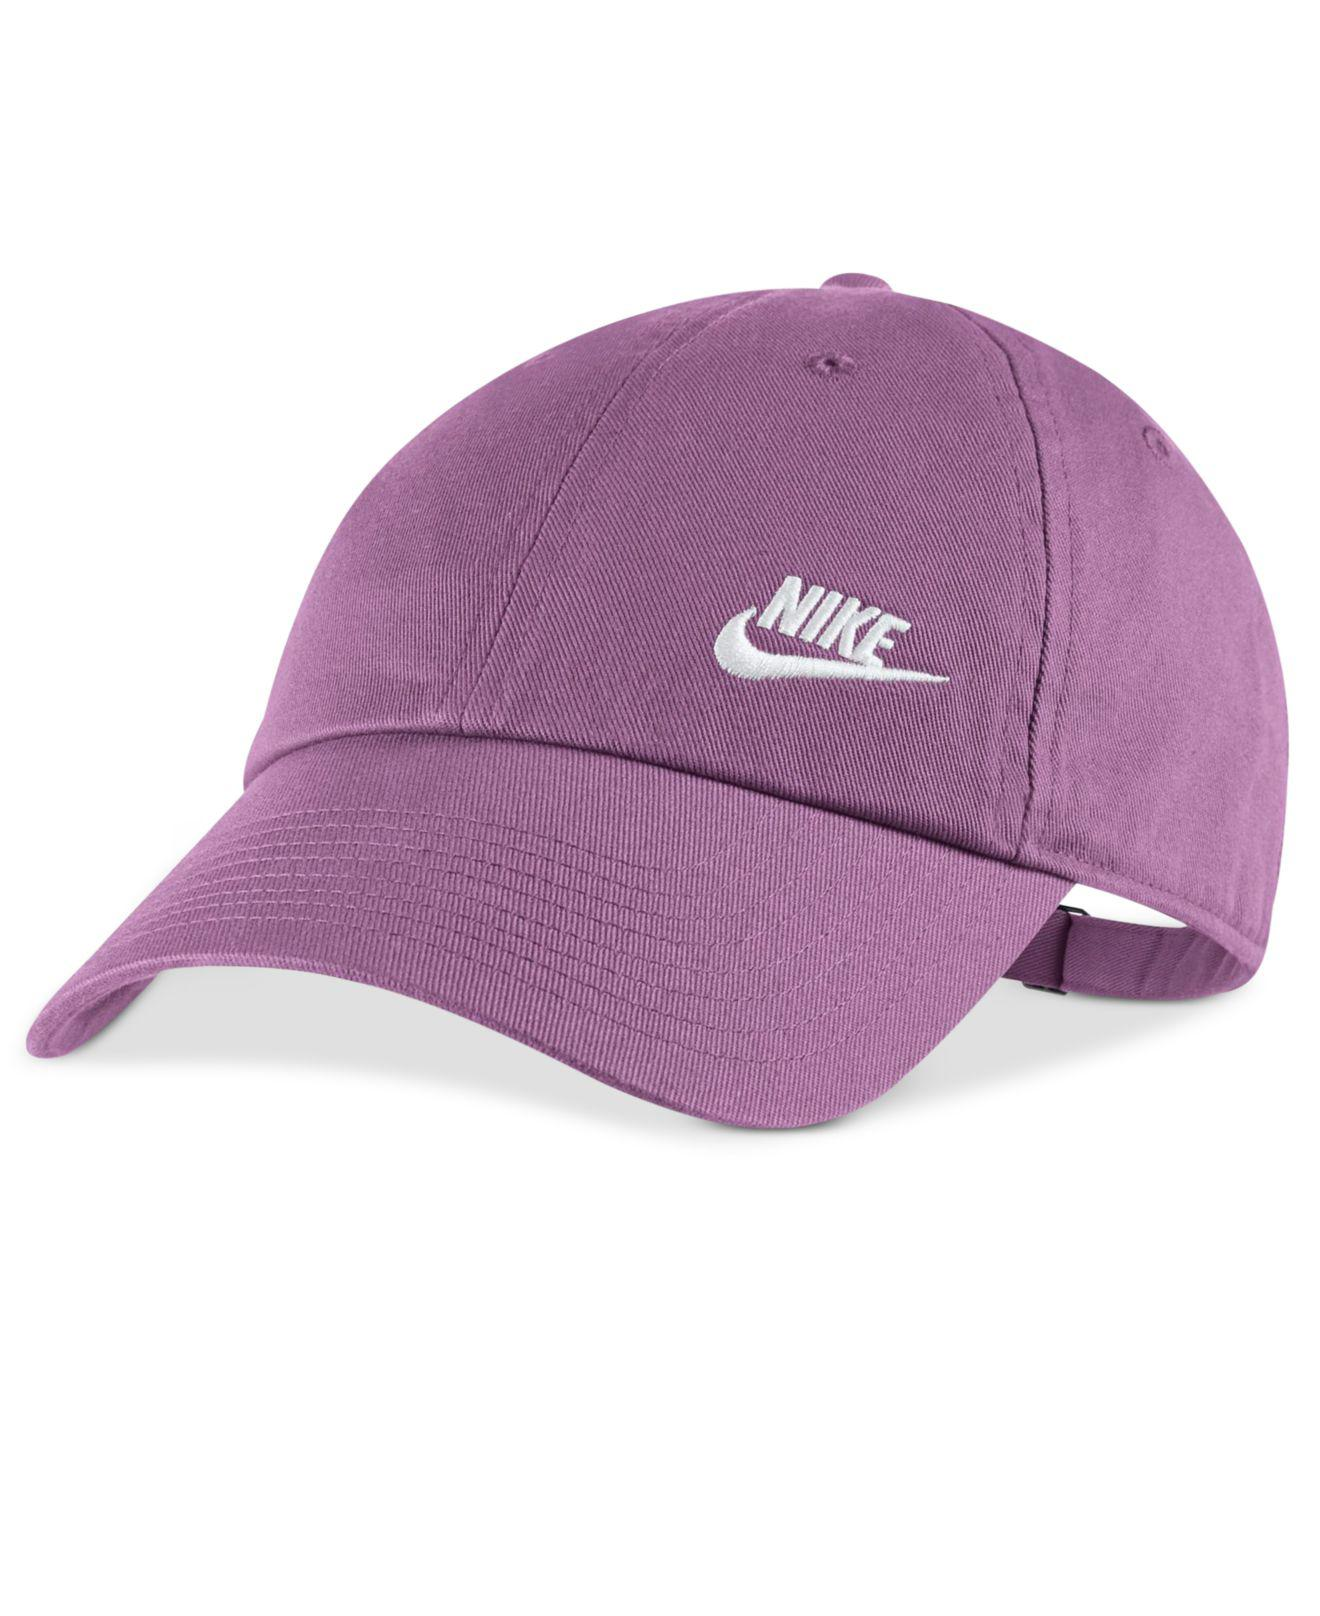 0c0cdcdbee8f8 ... uk lyst nike futura cotton hat in purple 90ff3 d5699